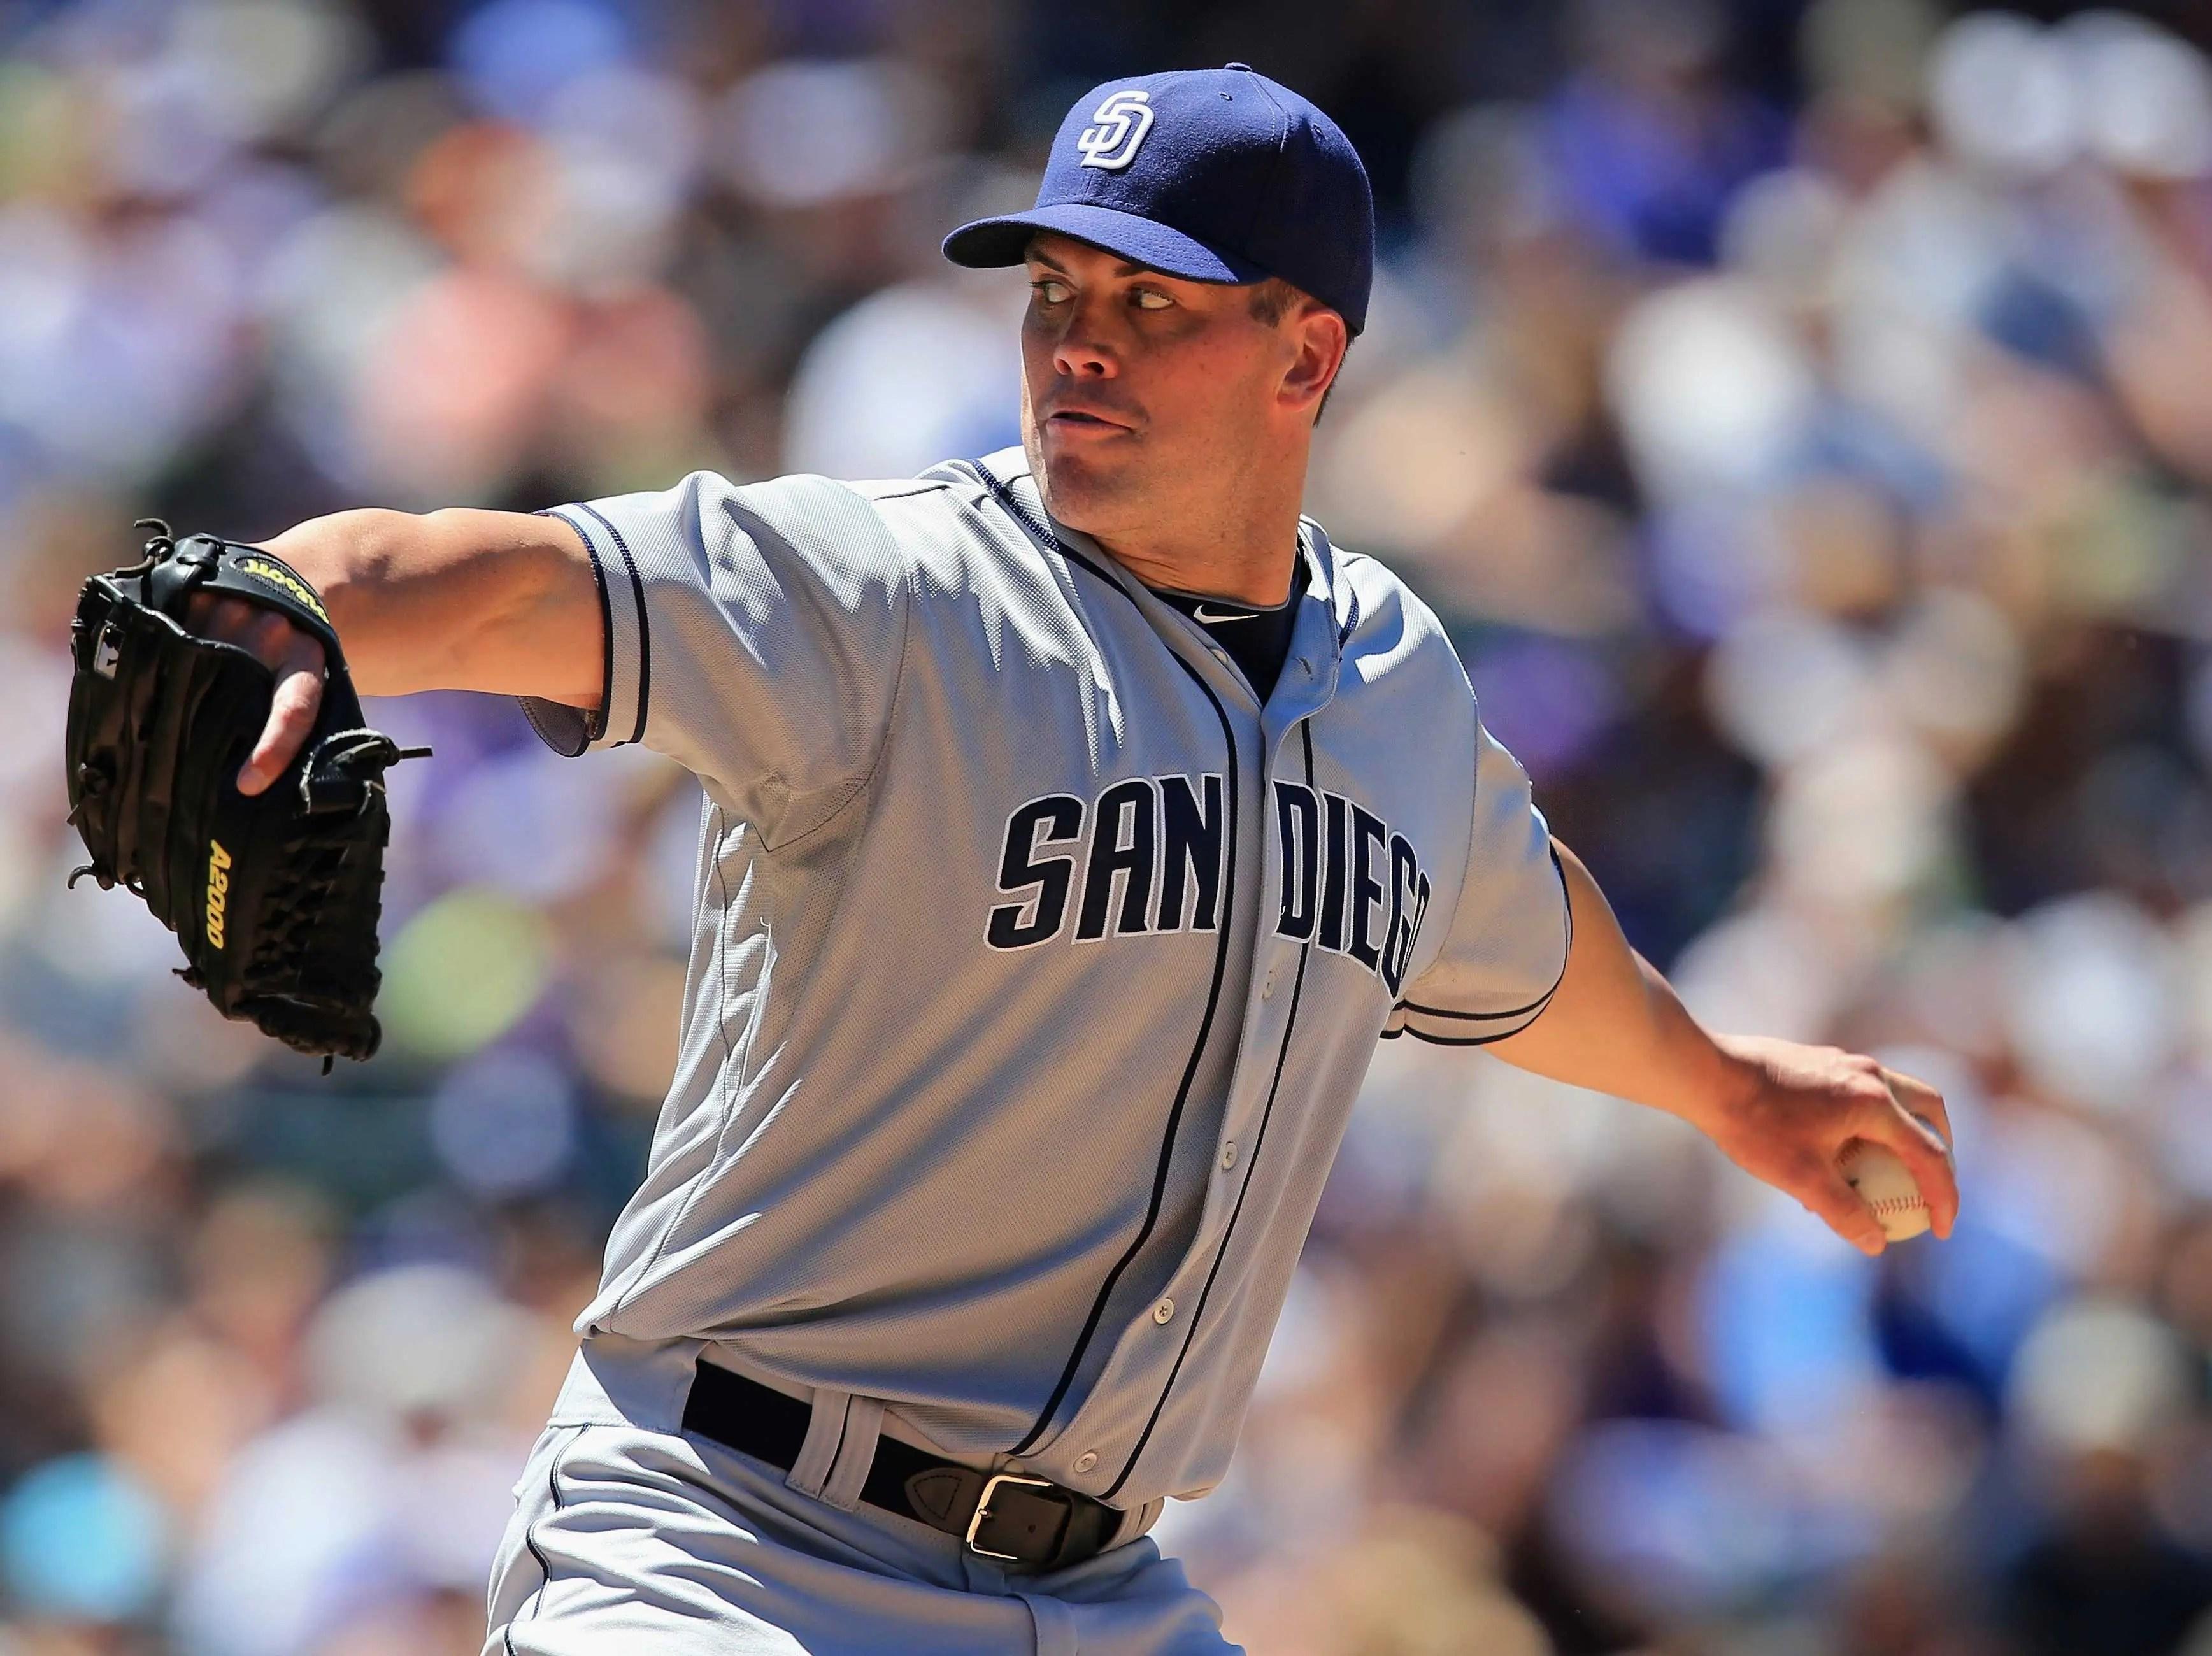 #9 Clayton Richard, San Diego Padres